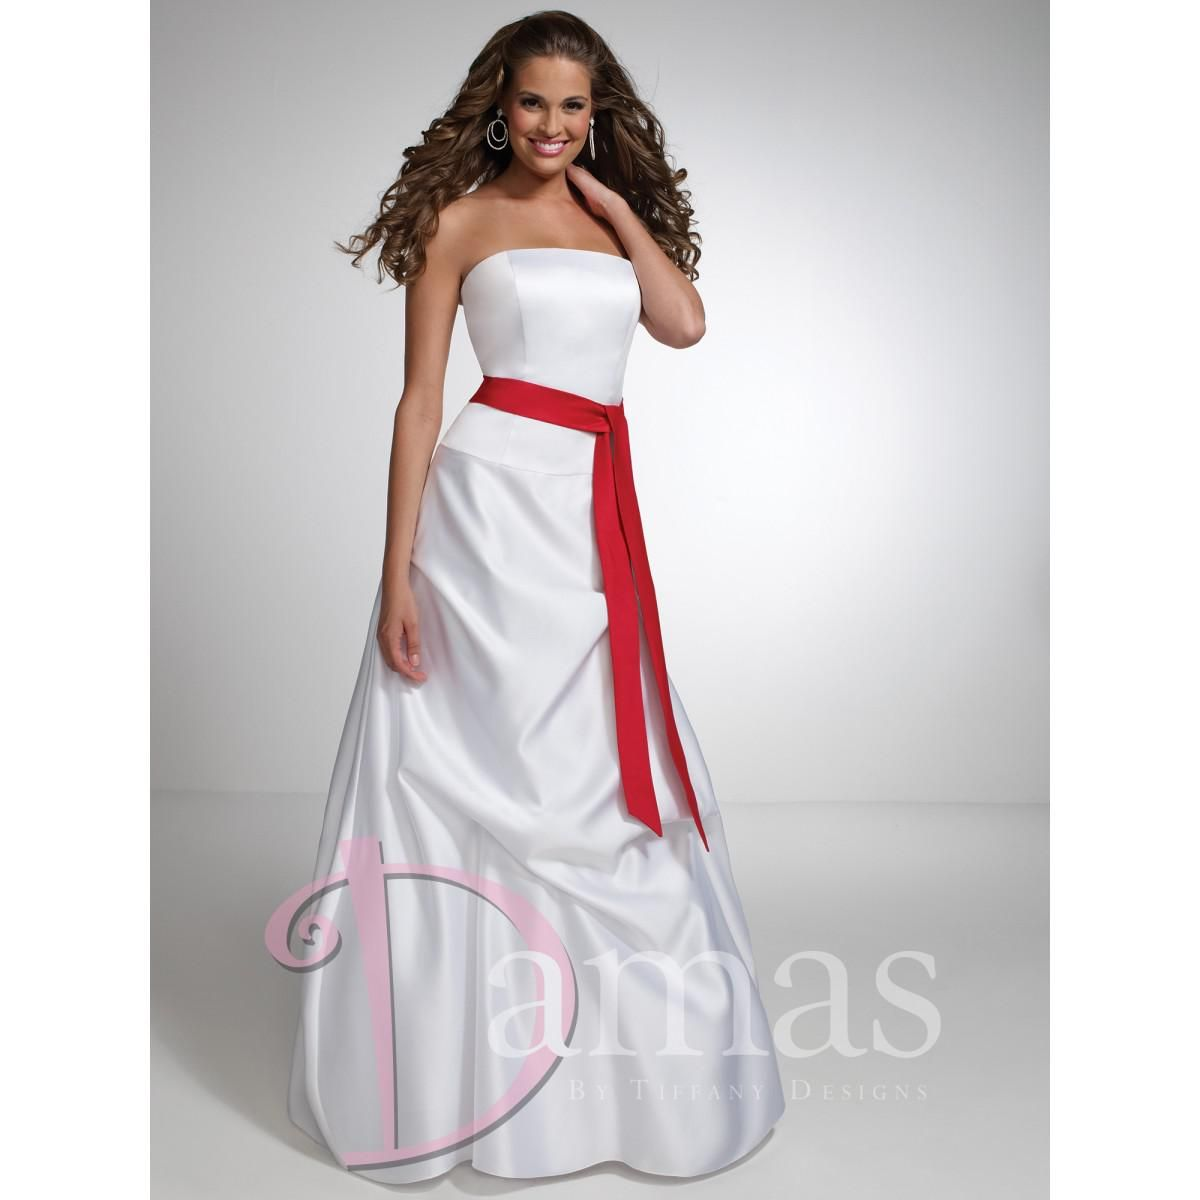 White red strapless long bridesmaid dresses sheath taffeta ruched